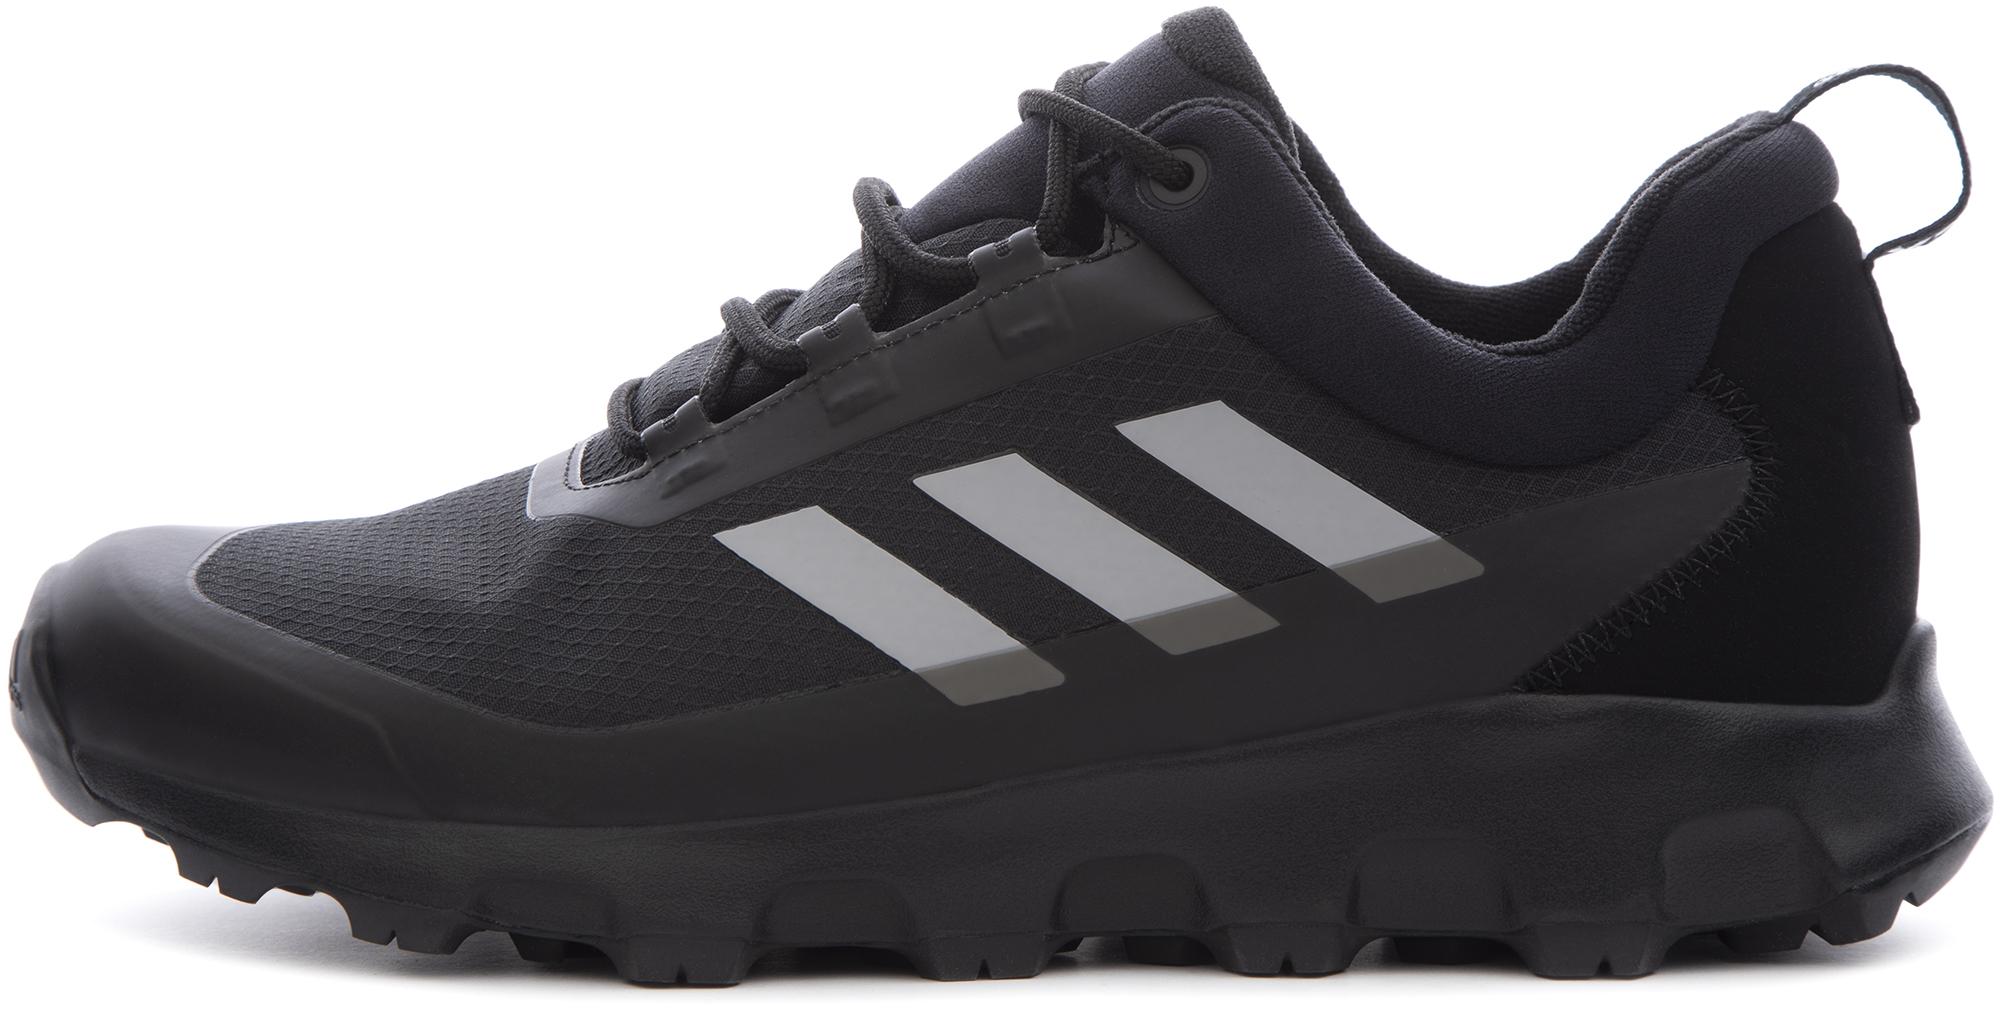 Adidas Ботинки мужские Terrex CP CW Voyager, размер 45